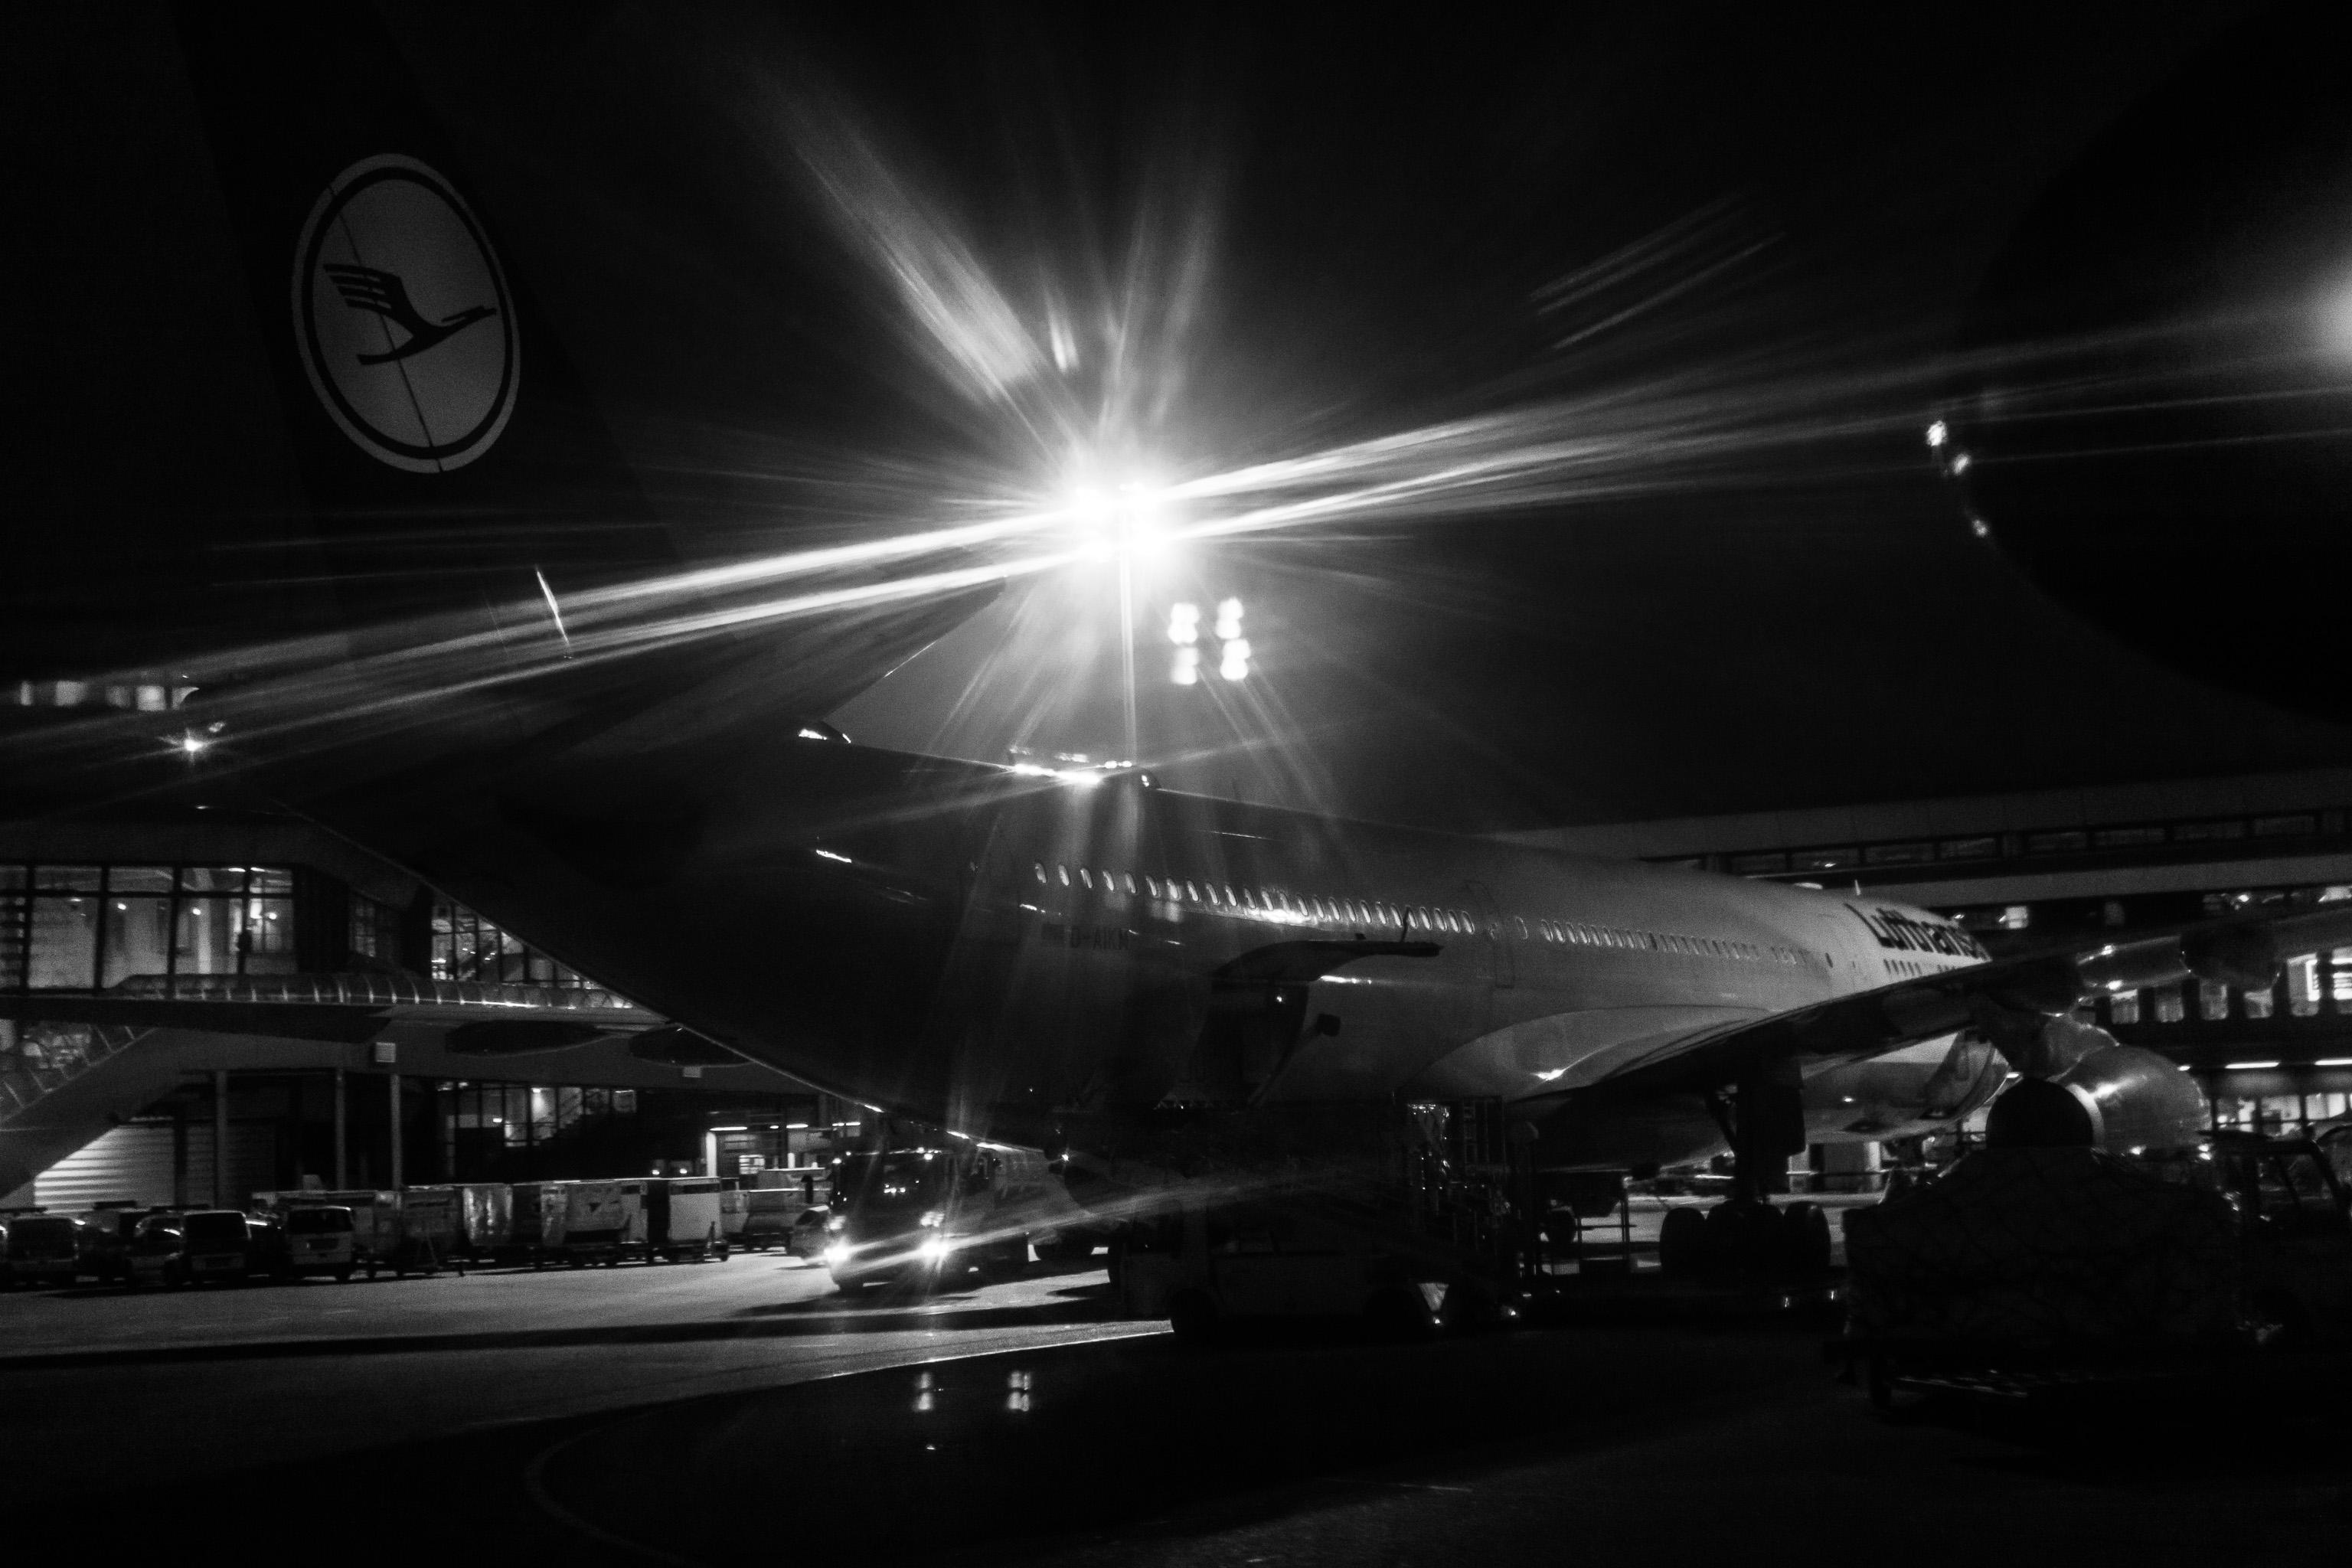 Vol de Nuit (16 von 16)